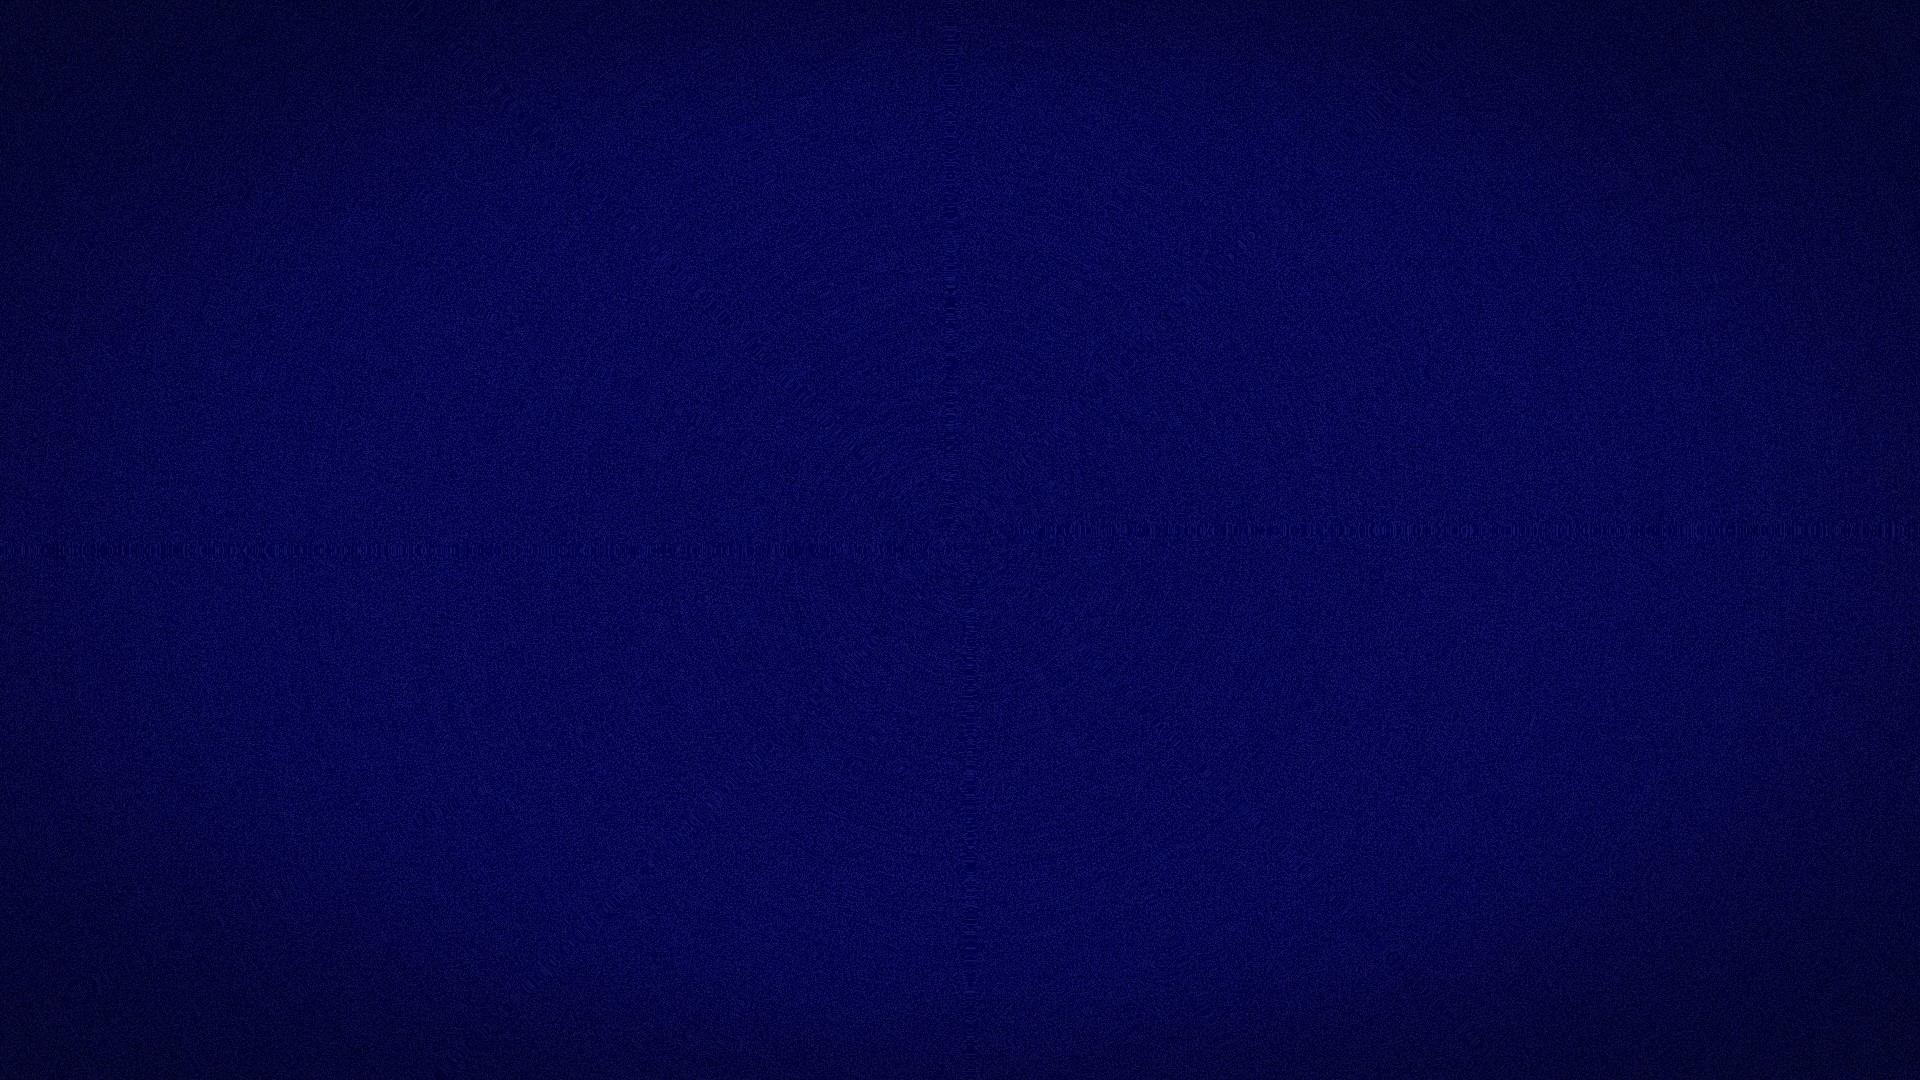 Solid Blue Wallpaper